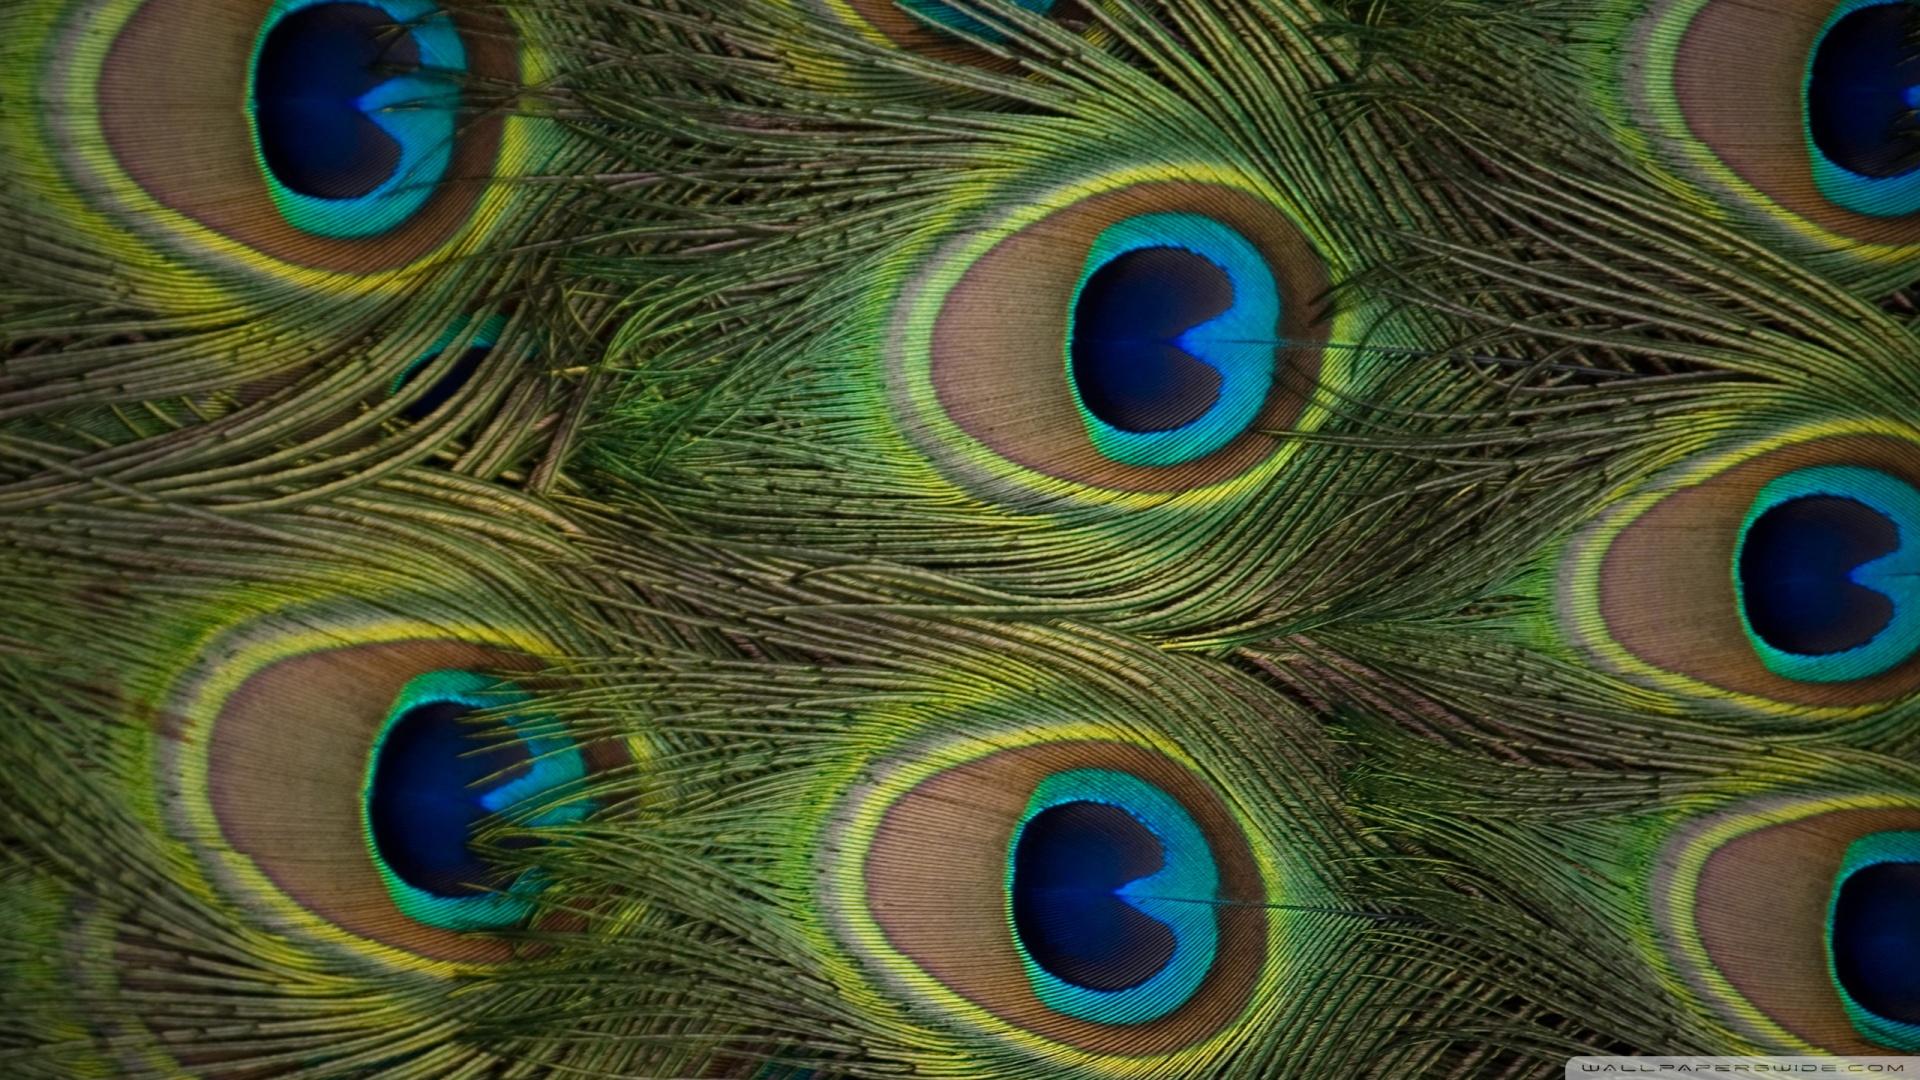 Download Peacock Feathers Wallpaper 1920x1080 Wallpoper 1920x1080